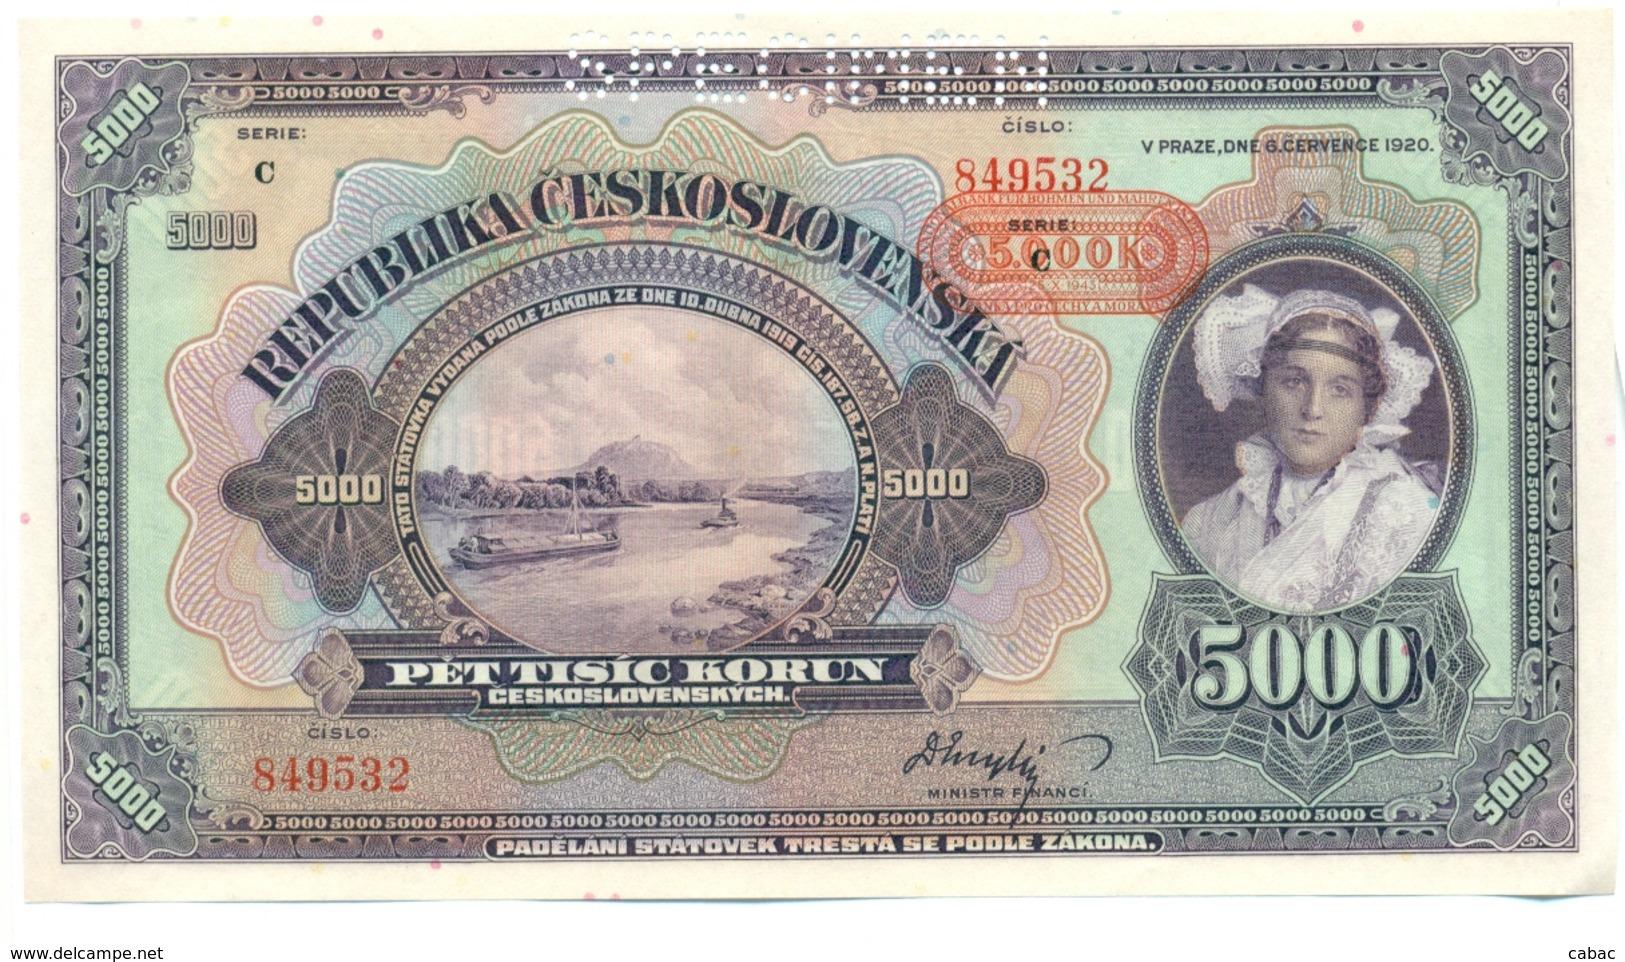 Czechoslovakia, 5000 Korun, 1920, SPECIMEN, Pet Tisic Korun, Narodna Banka Češkoslovenska, Serie C - Tchécoslovaquie